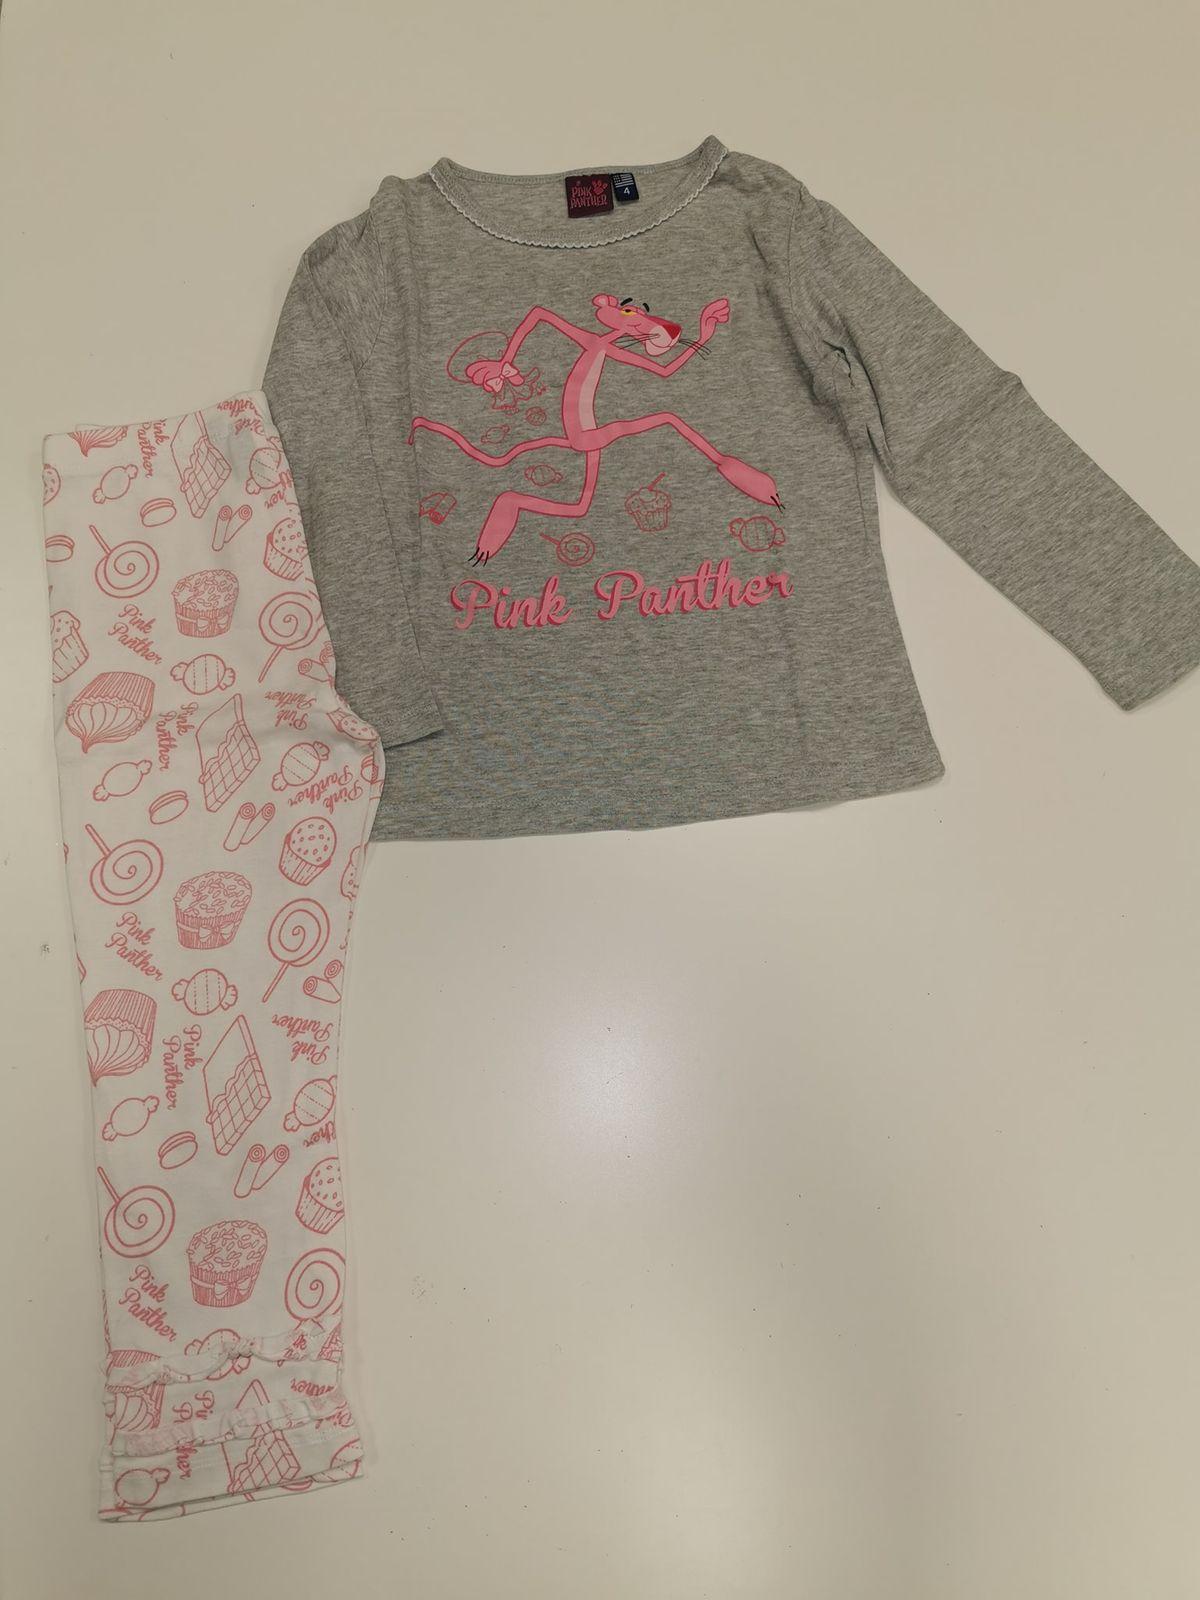 Om pigiama lungo fresco cotone 4 anni 12120 Euro 7,90